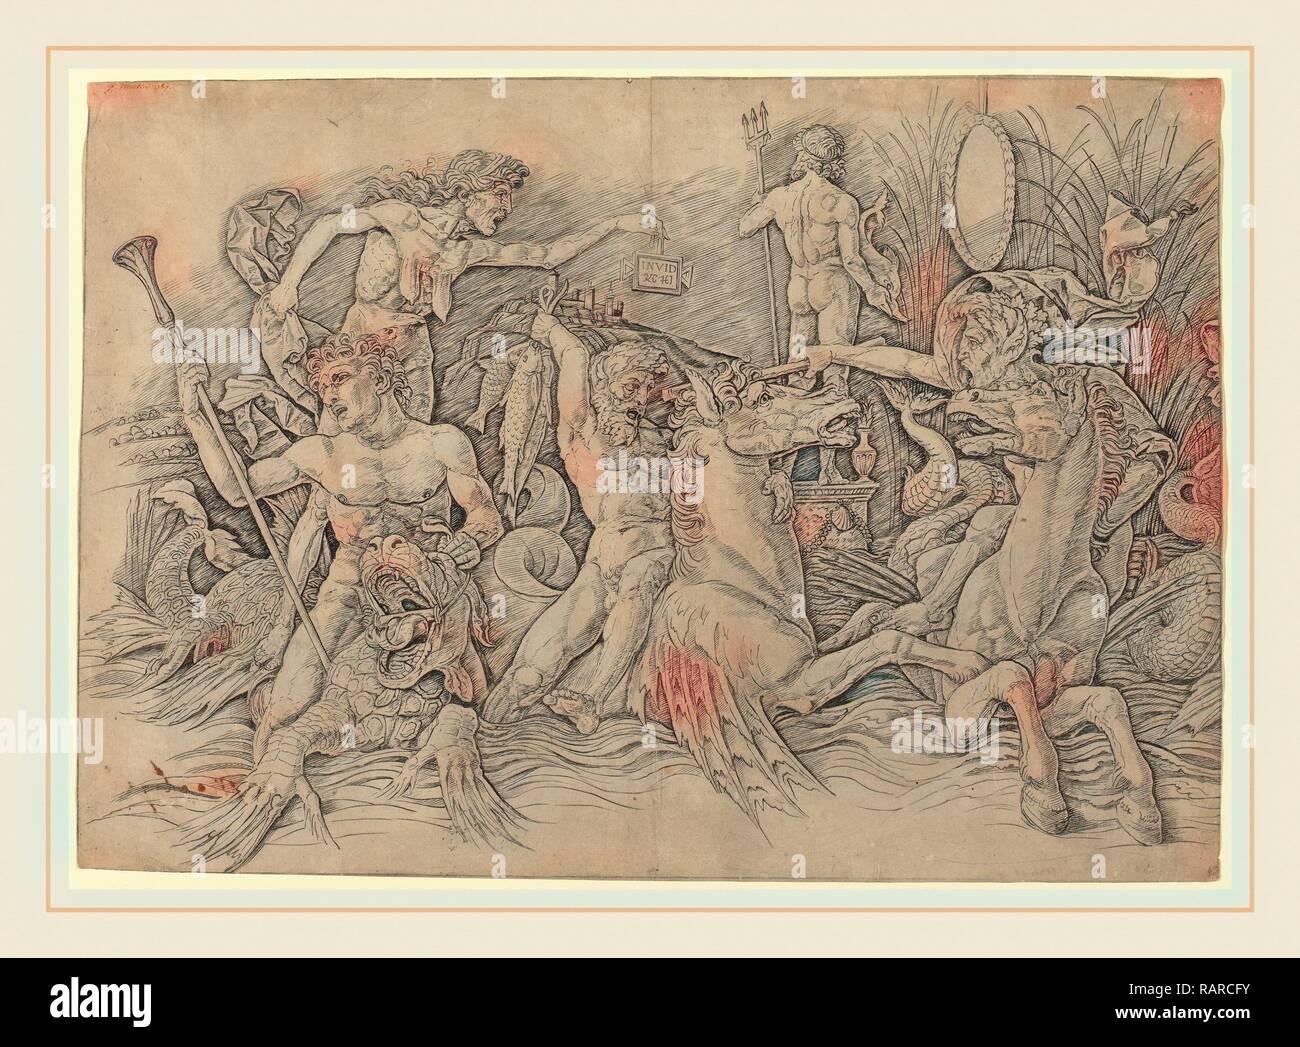 Andrea Mantegna (Italian, c. 1431-1506), Battle of the Sea Gods [left half], c. 1485-1488, engraving. Reimagined - Stock Image